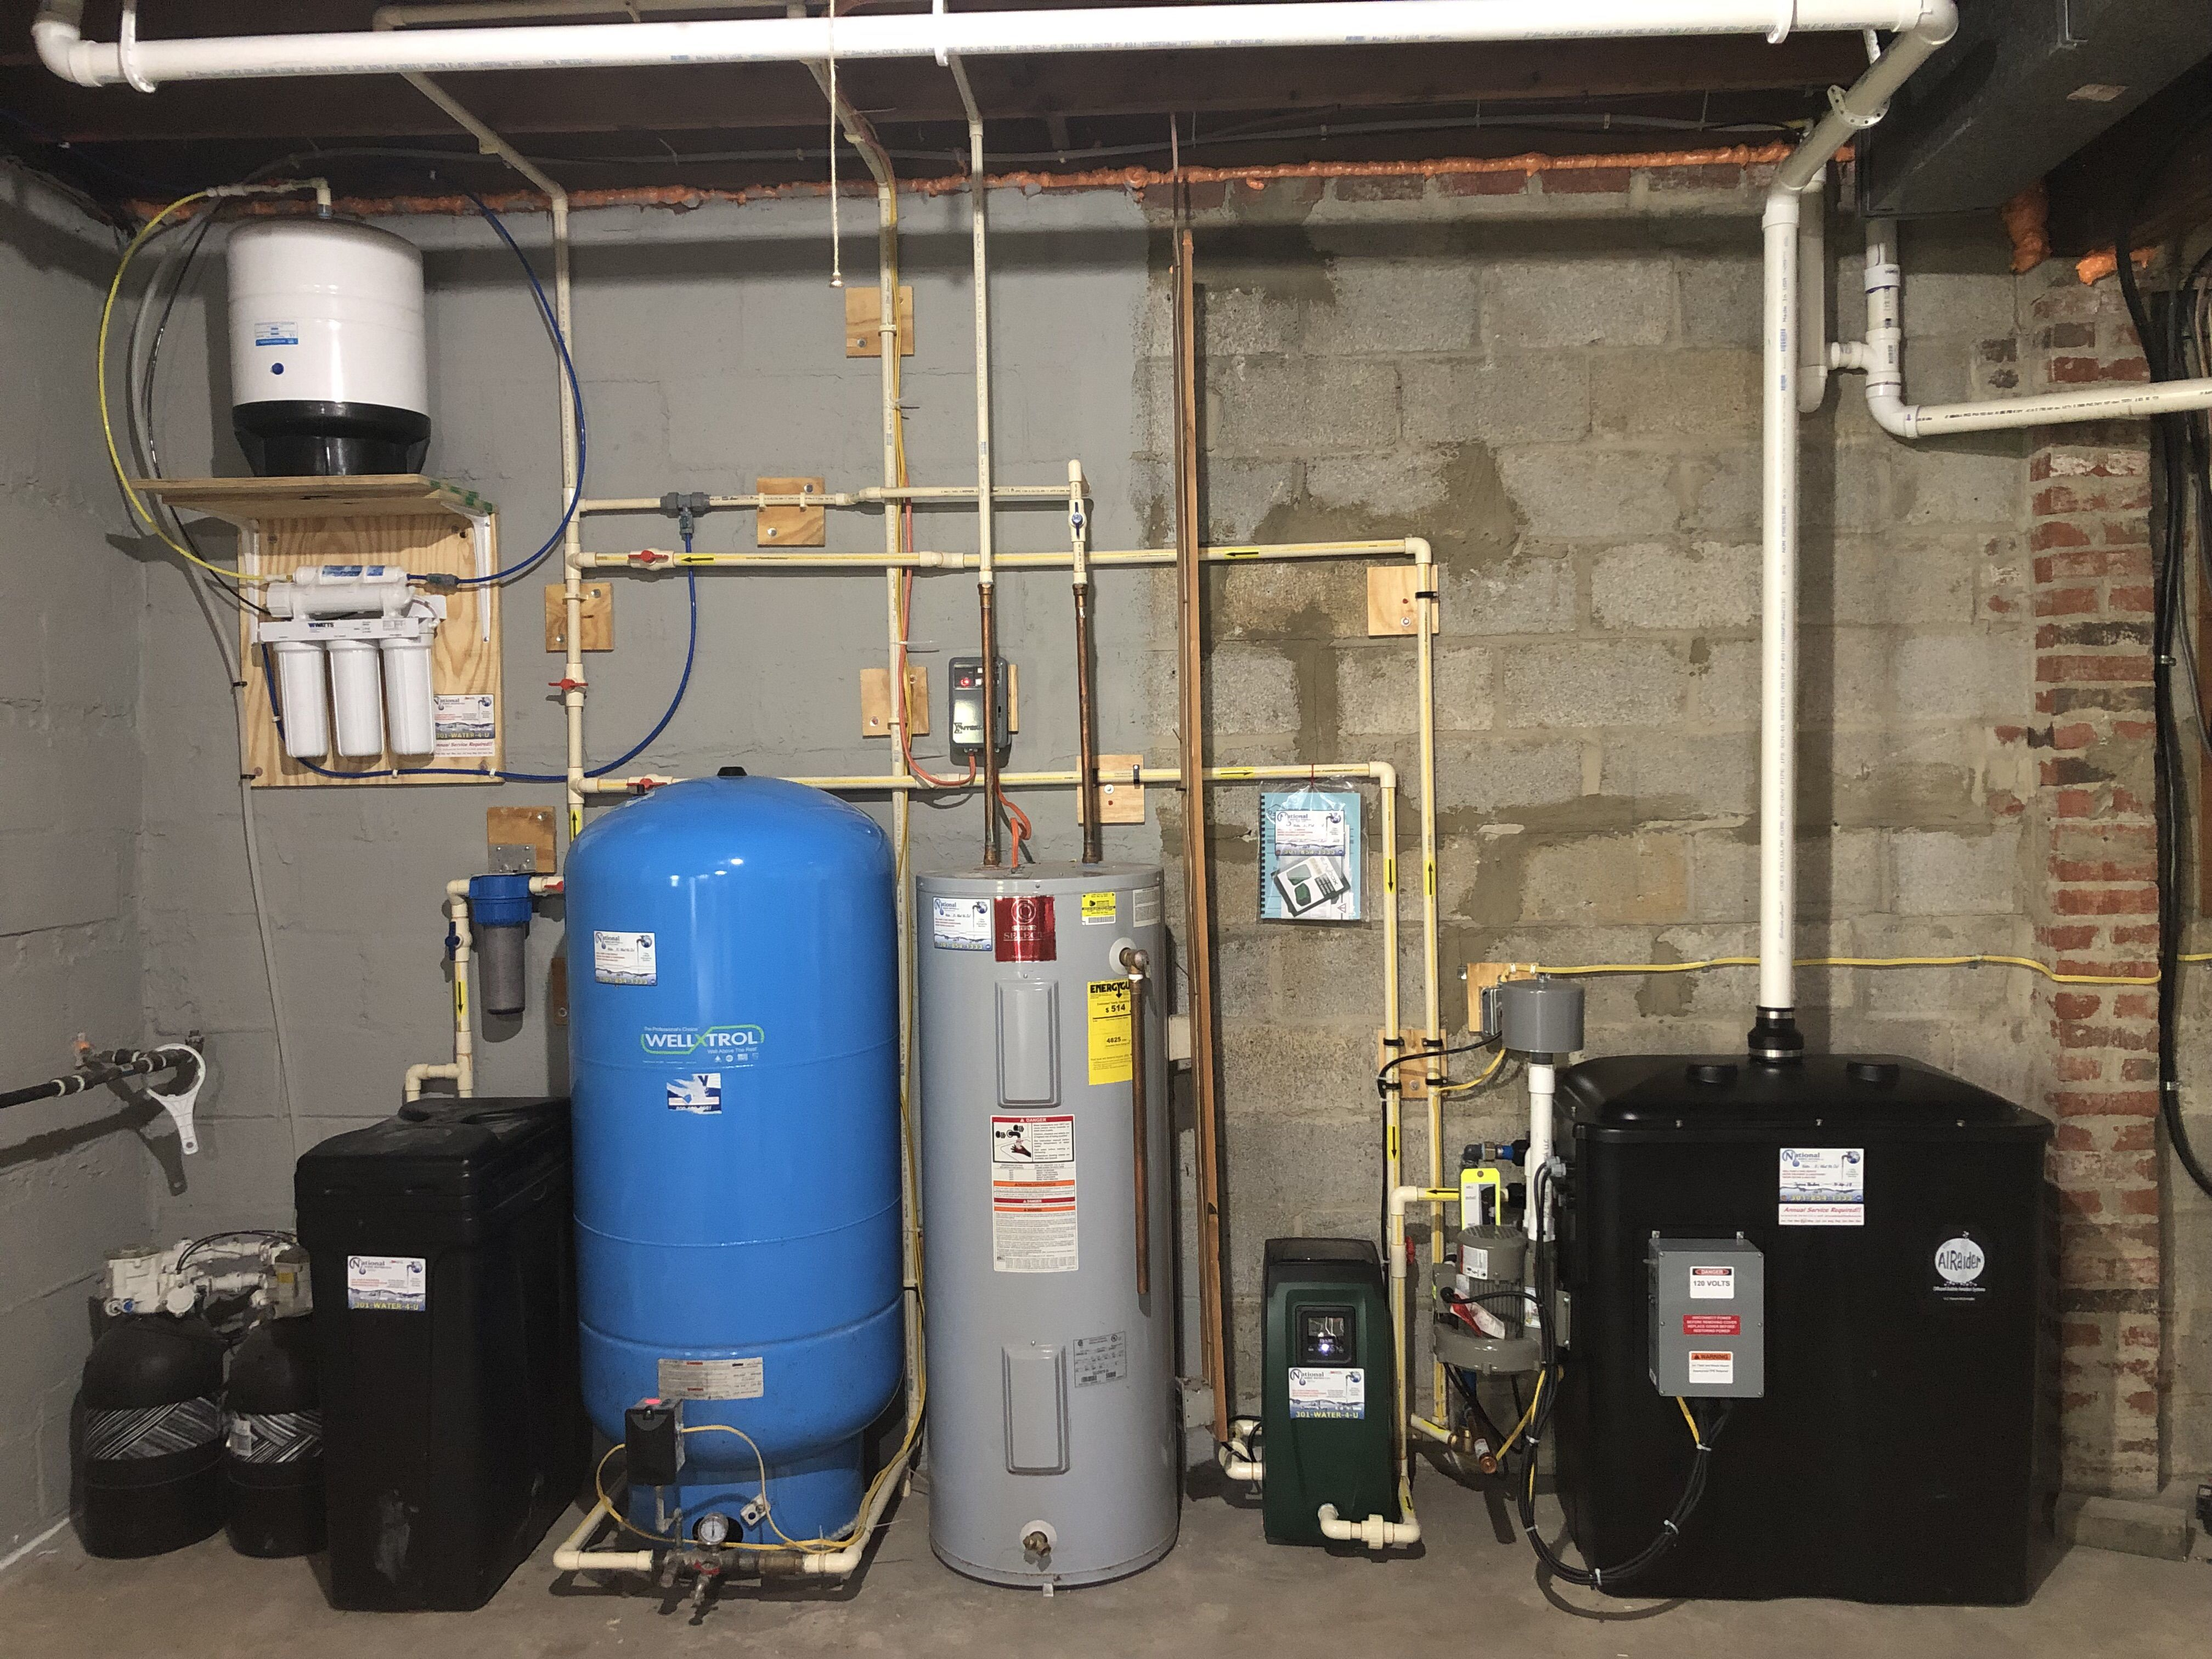 Radon Remediation Water Softener Sediment Filtration Water Heater Pressure Tank In 2020 Water Treatment Water Softener Water Heater